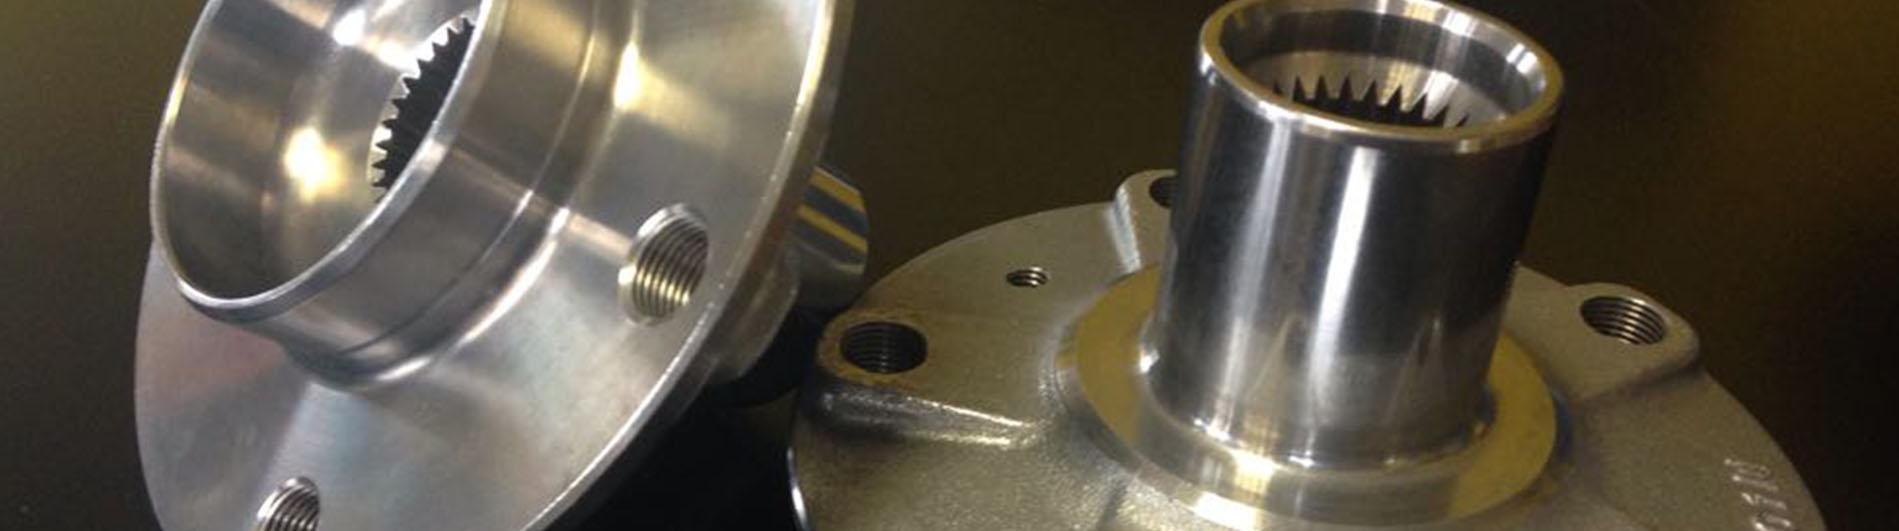 Nuova Vat - pulitura metalli - testata superlevigatura